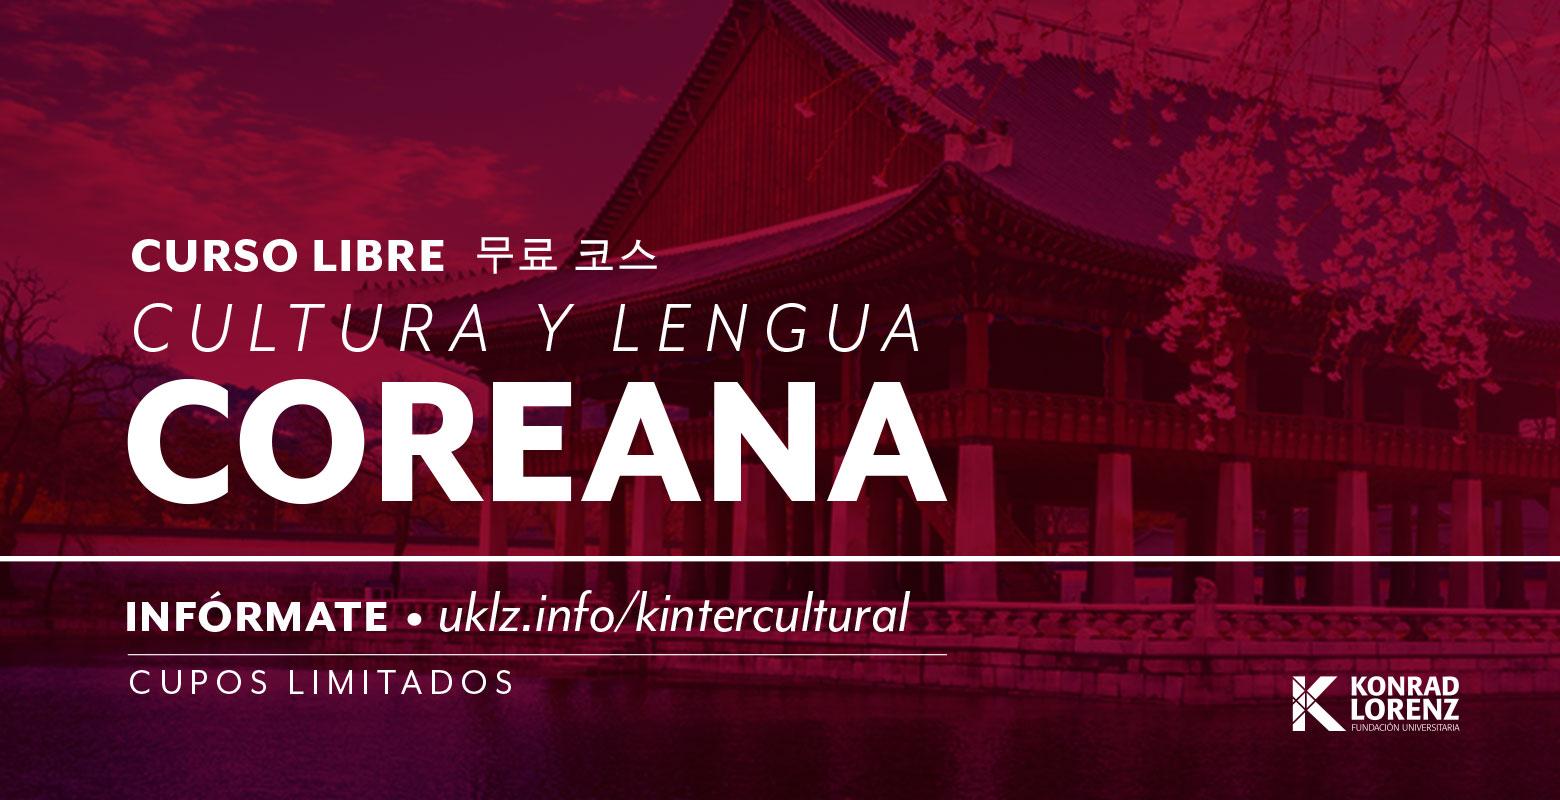 Curso libre extracurricular de Cultura y lengua Coreana